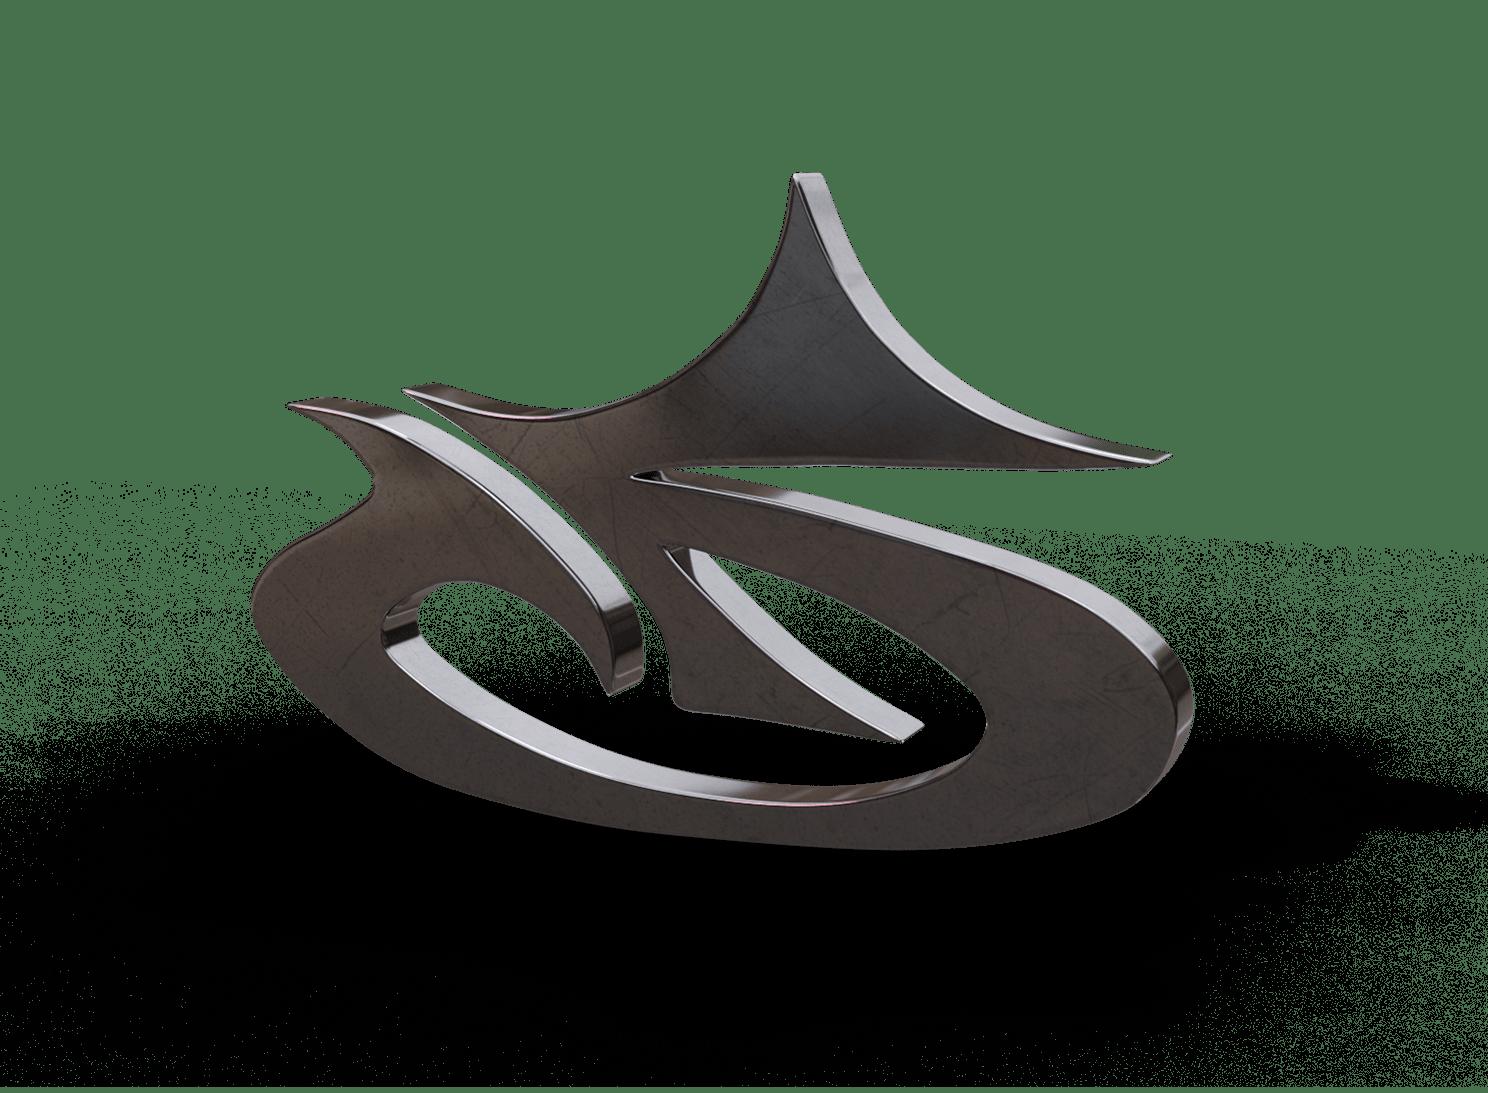 Company logo as an artistic sideways 'G' in 3D.